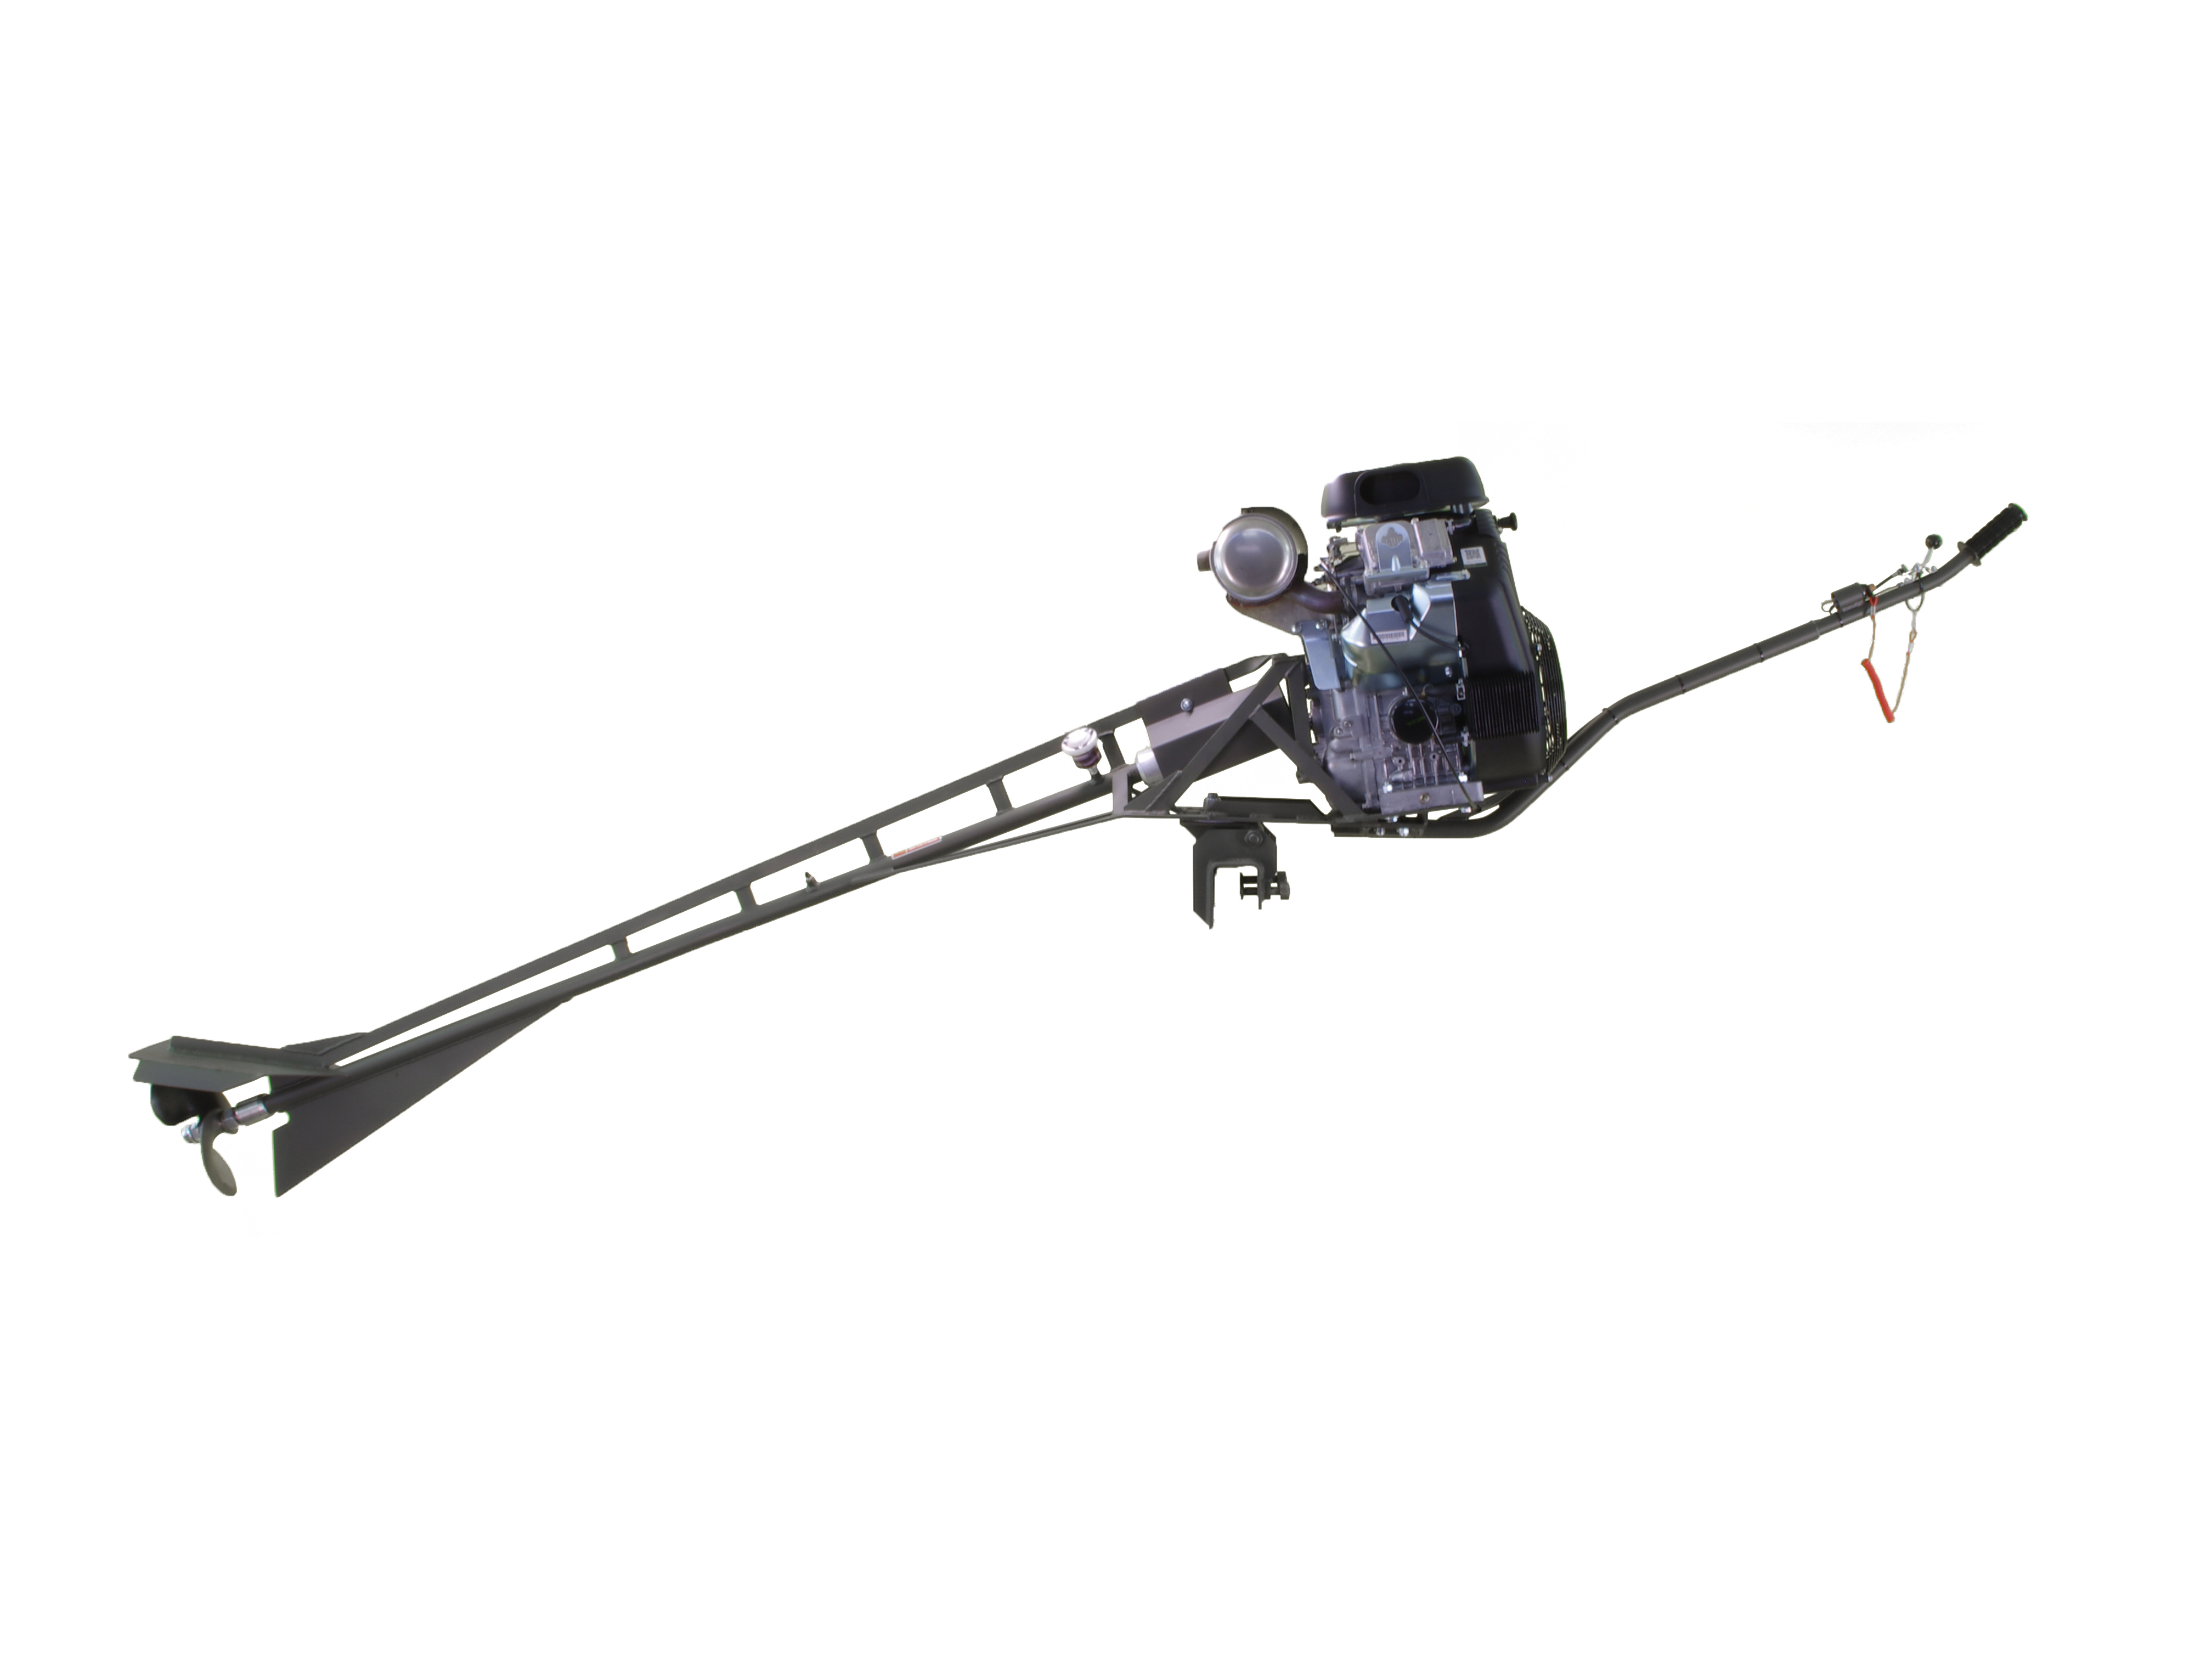 37 hp vanguard longtail